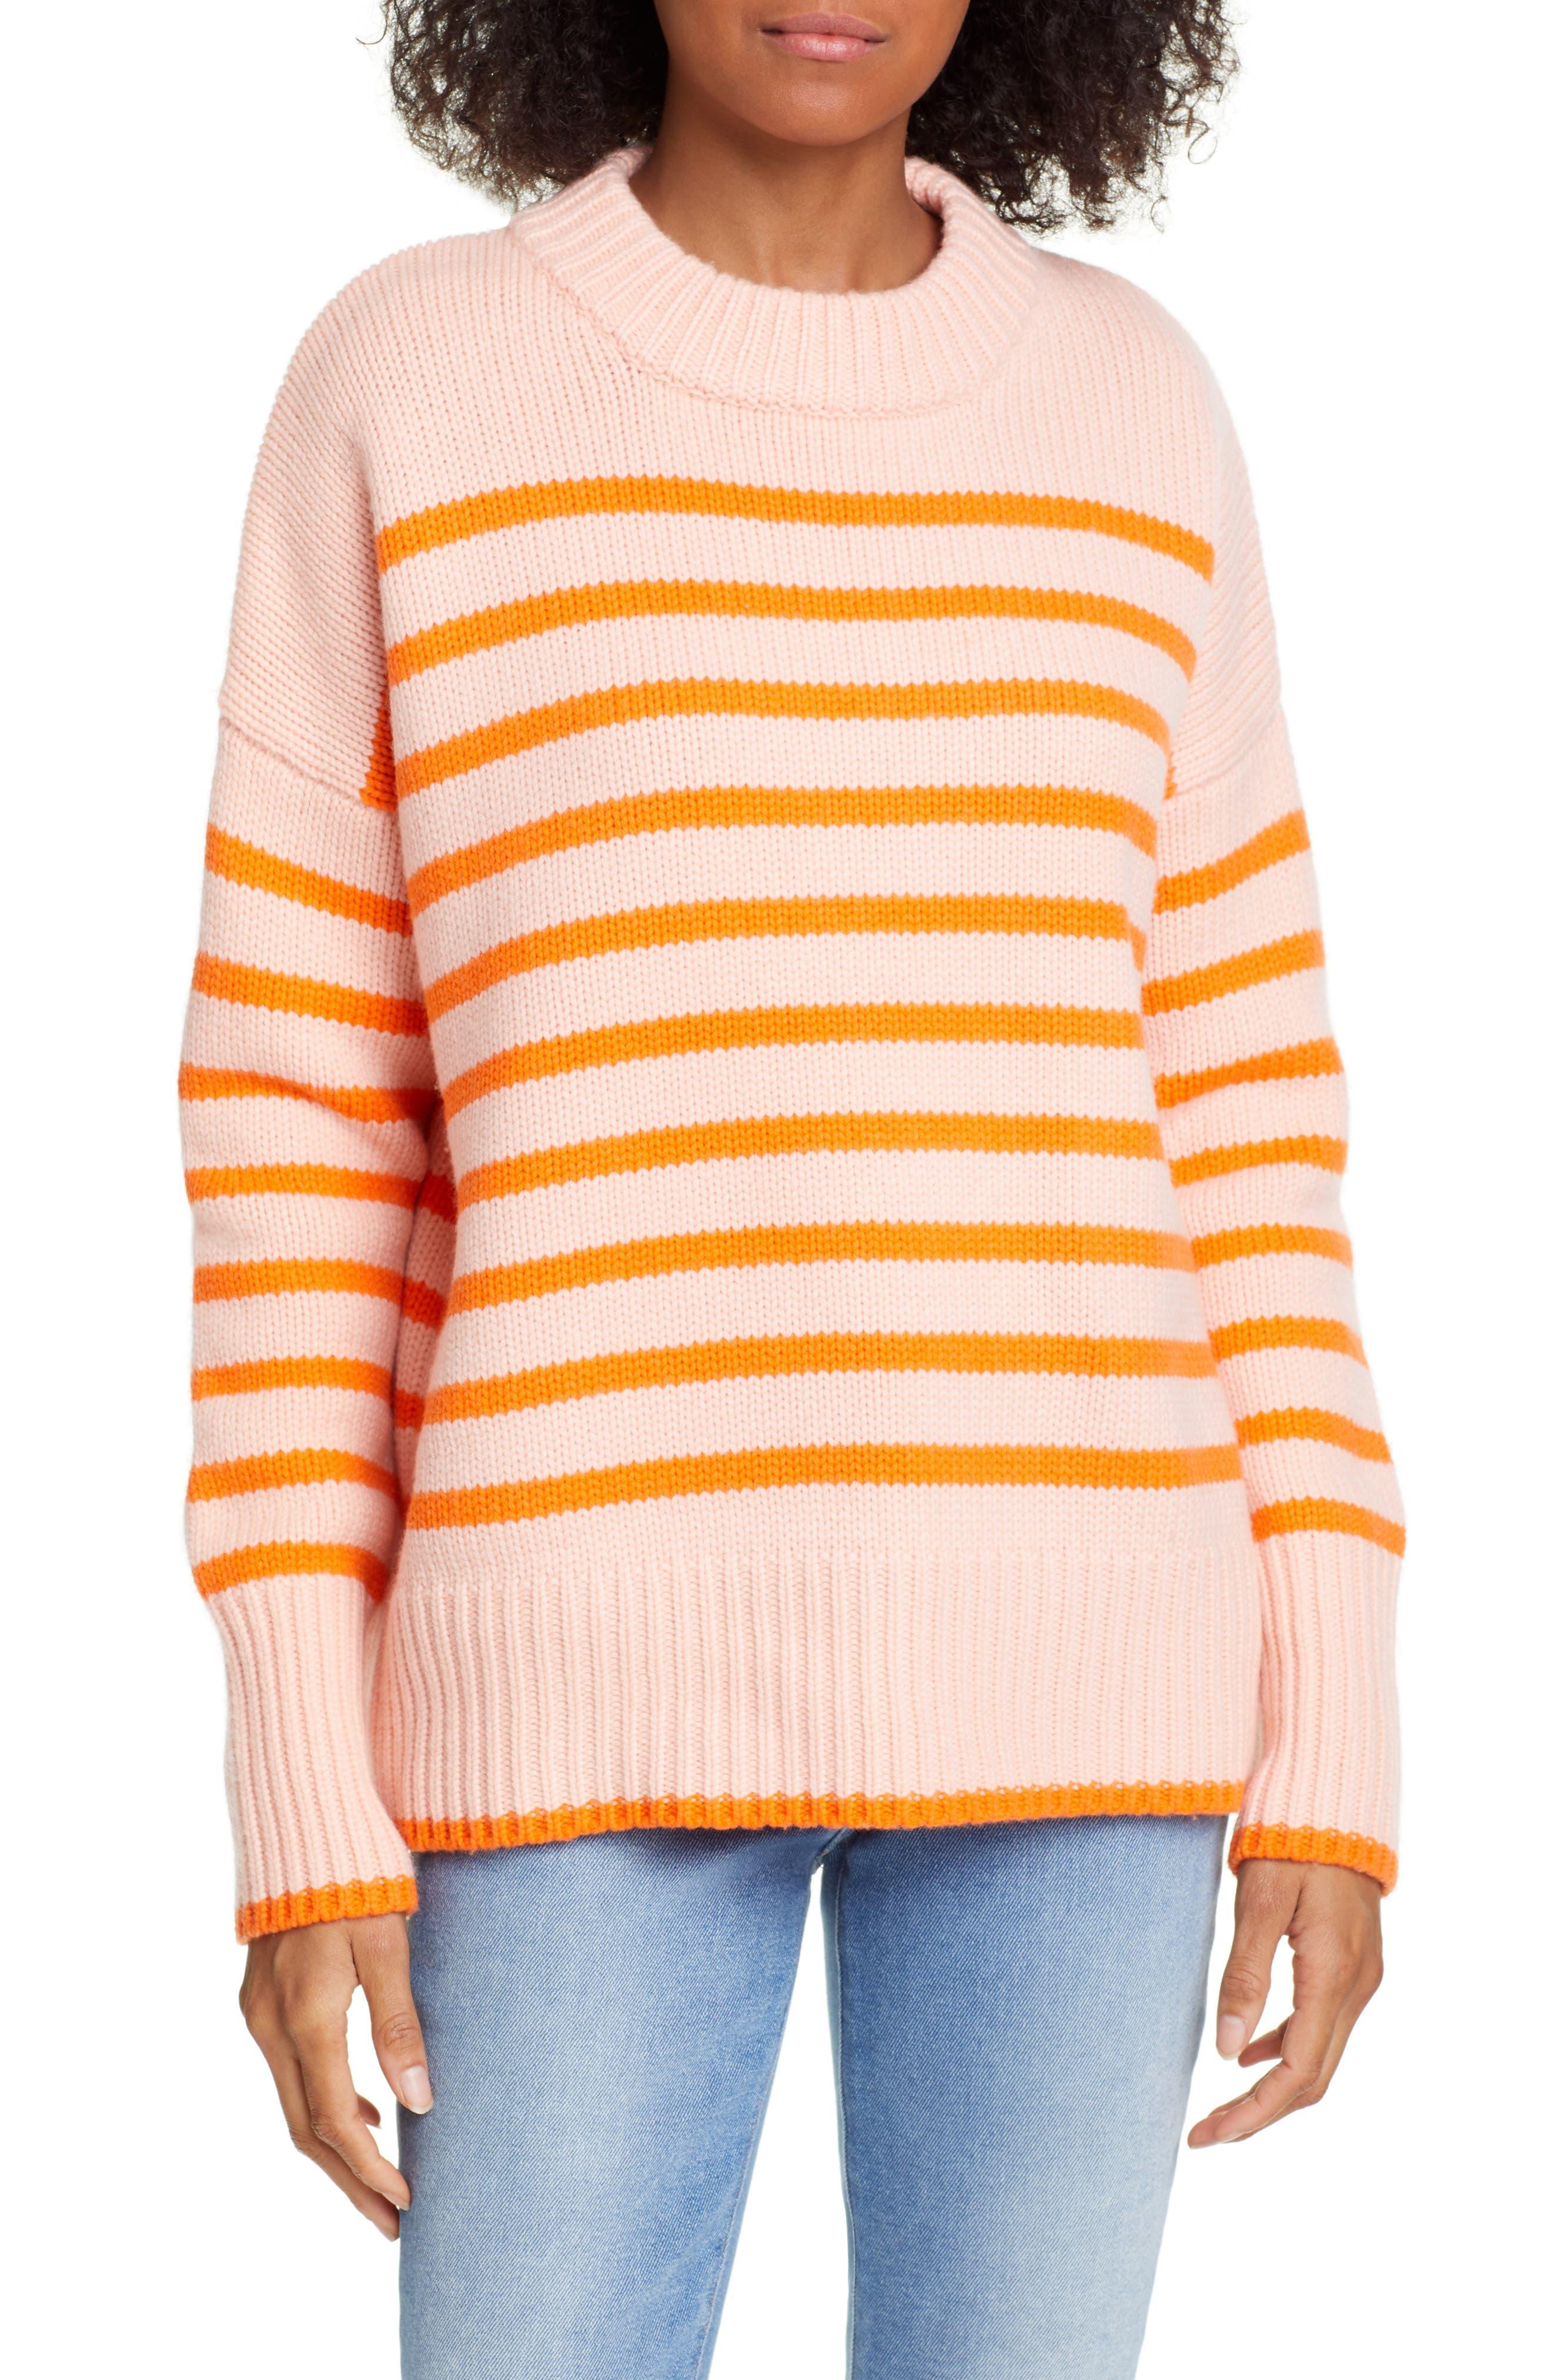 La Ligne Marin Wool & Cashmere Sweater, Orange